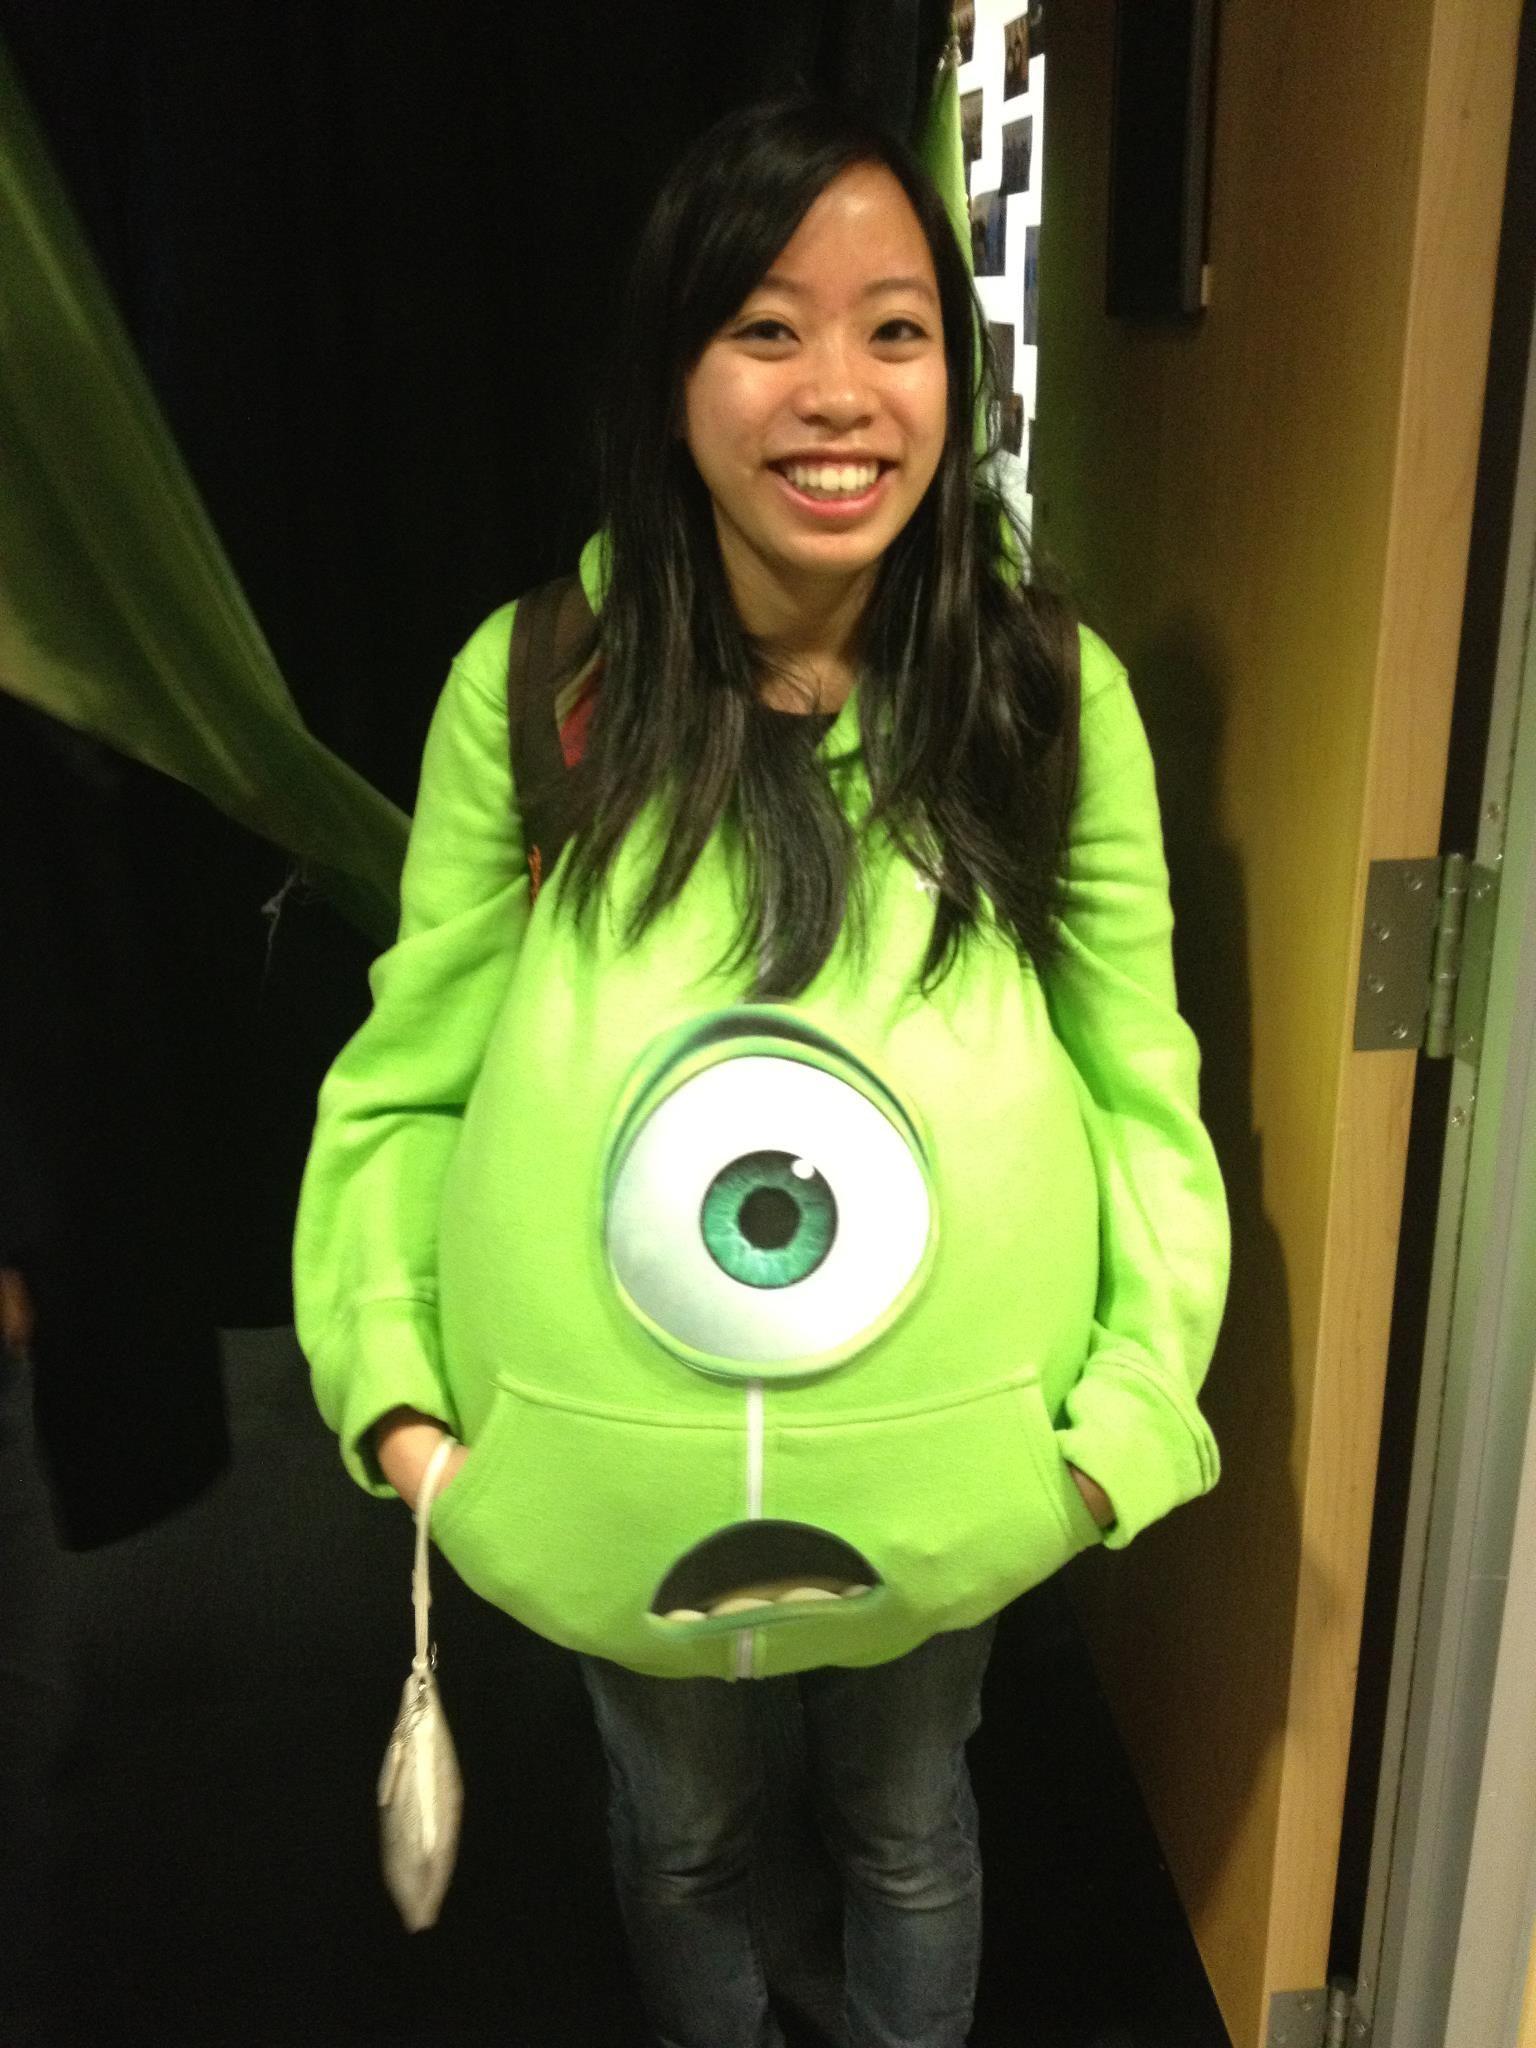 How To Make A Mike Wazowski Monster S Inc Costume Monster Inc Costumes Mike Wazowski Costume Monsters Inc Costume Diy